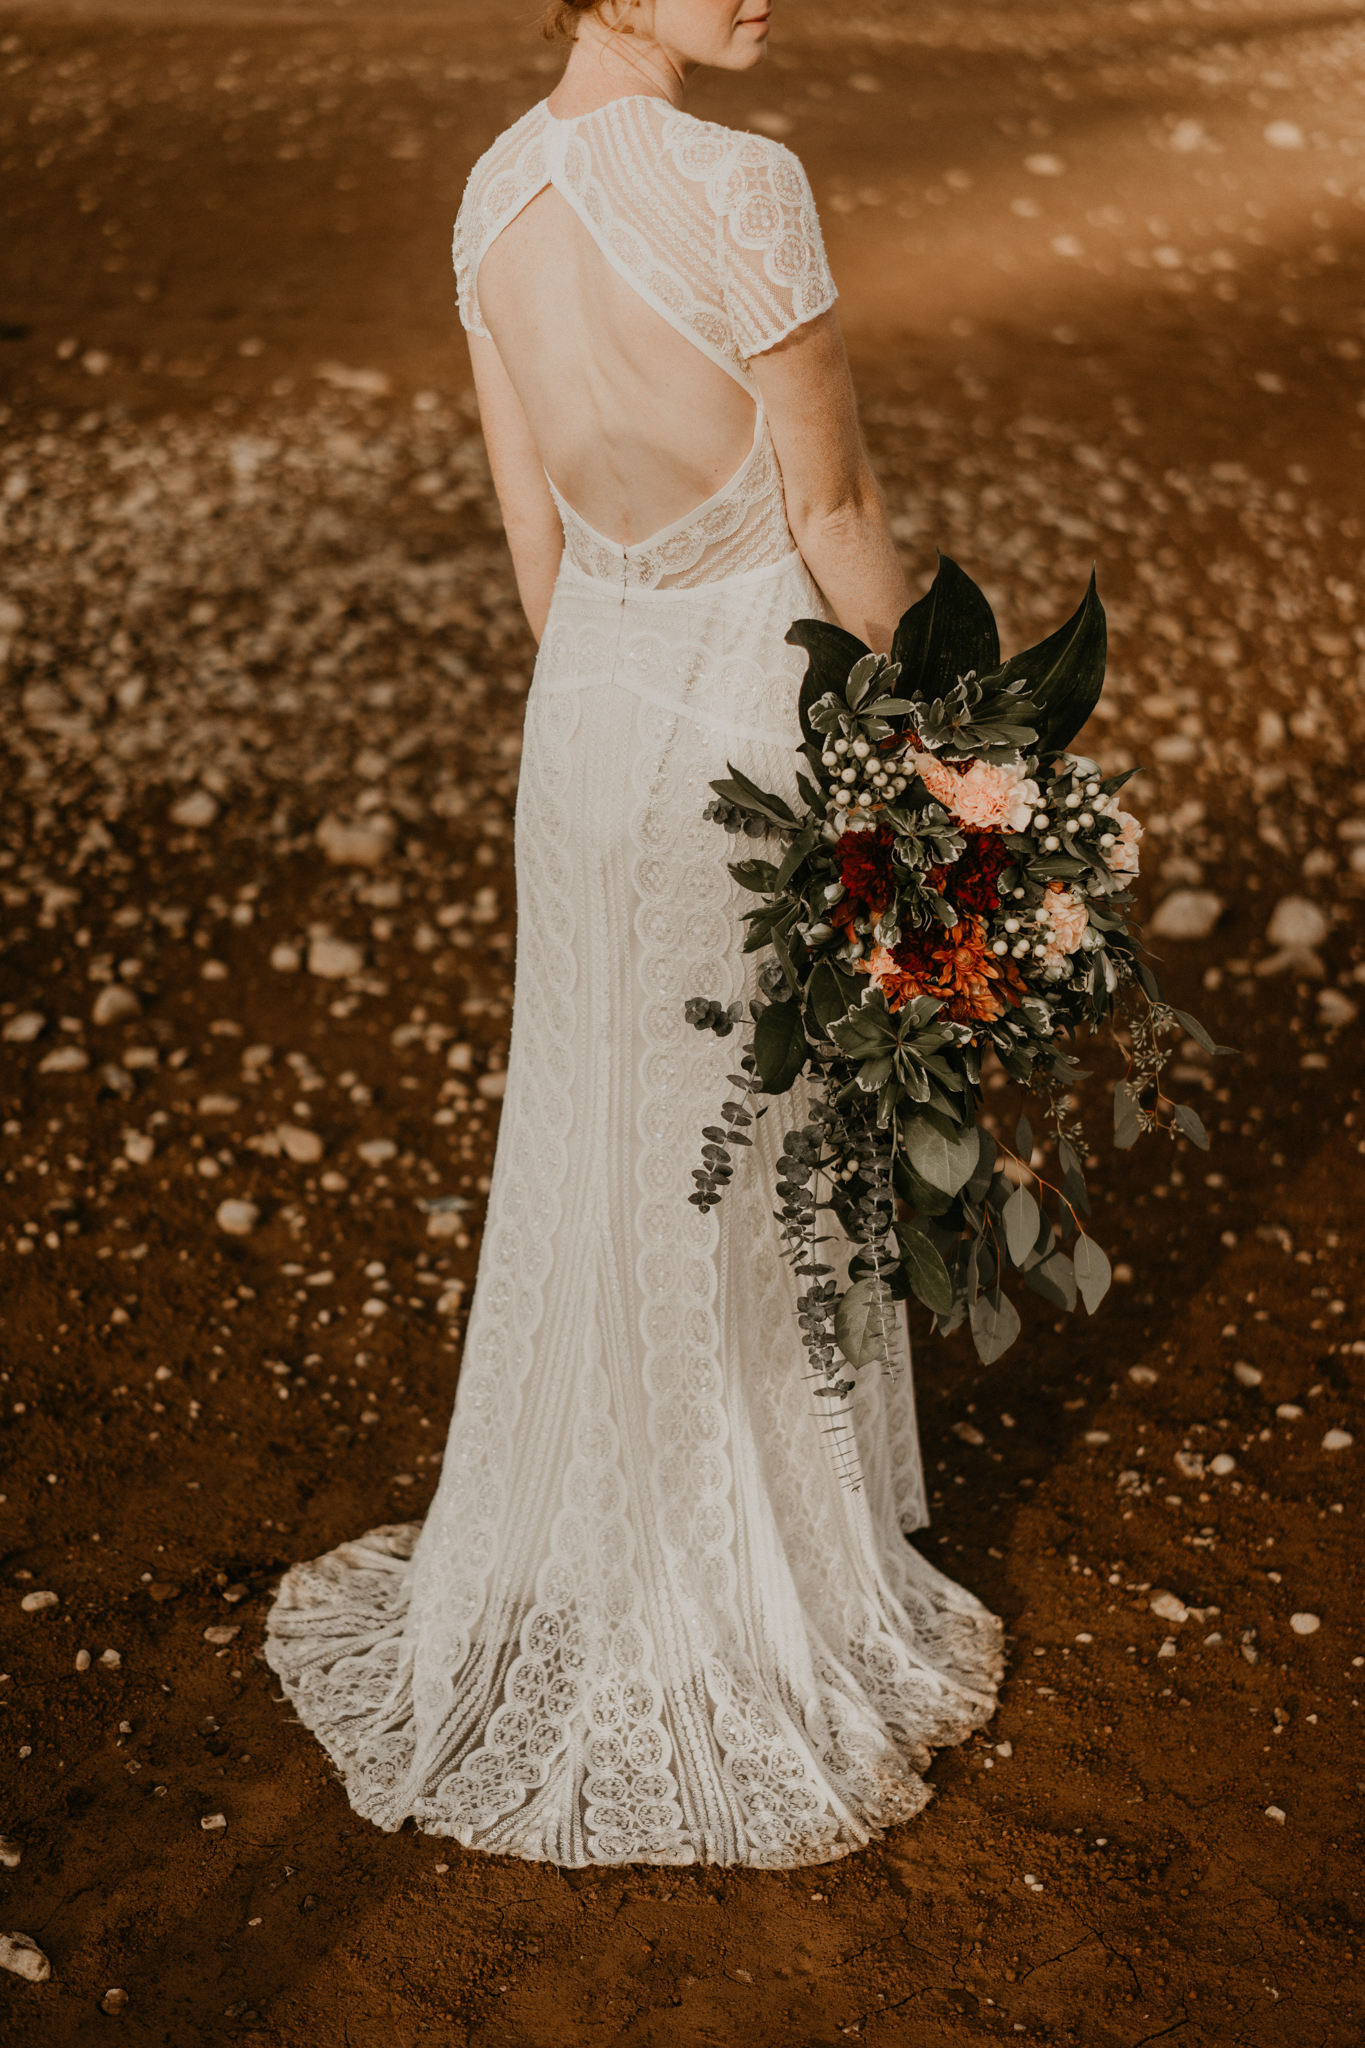 Lake-Cushman-Wedding-Elopement-Engagement-Seattle-Washington-PNW-Adventure-Nature-Photographer-16.jpg